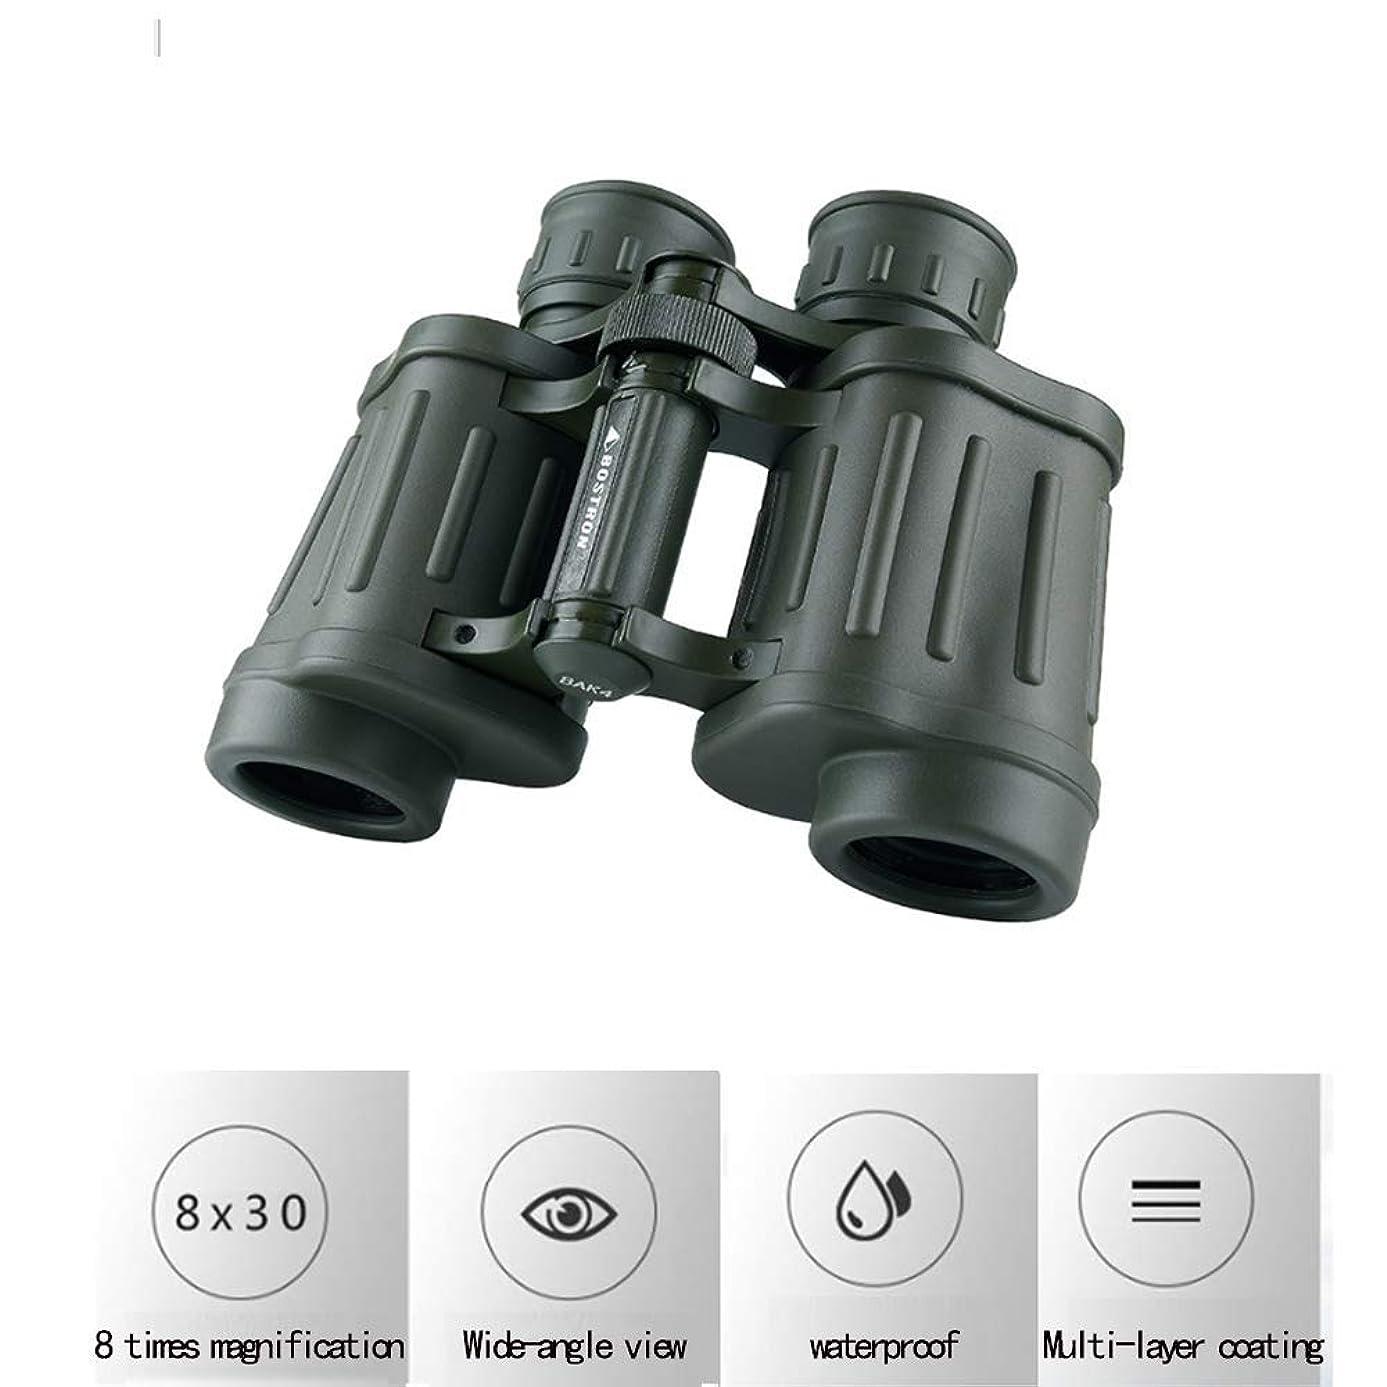 ZYG.GG Outdoor Binoculars Ultra Wide-Angle Telescope Waterproof Adult Telescope Pocket Small Night Vision Binoculars Hiking Hunting Sightseeing